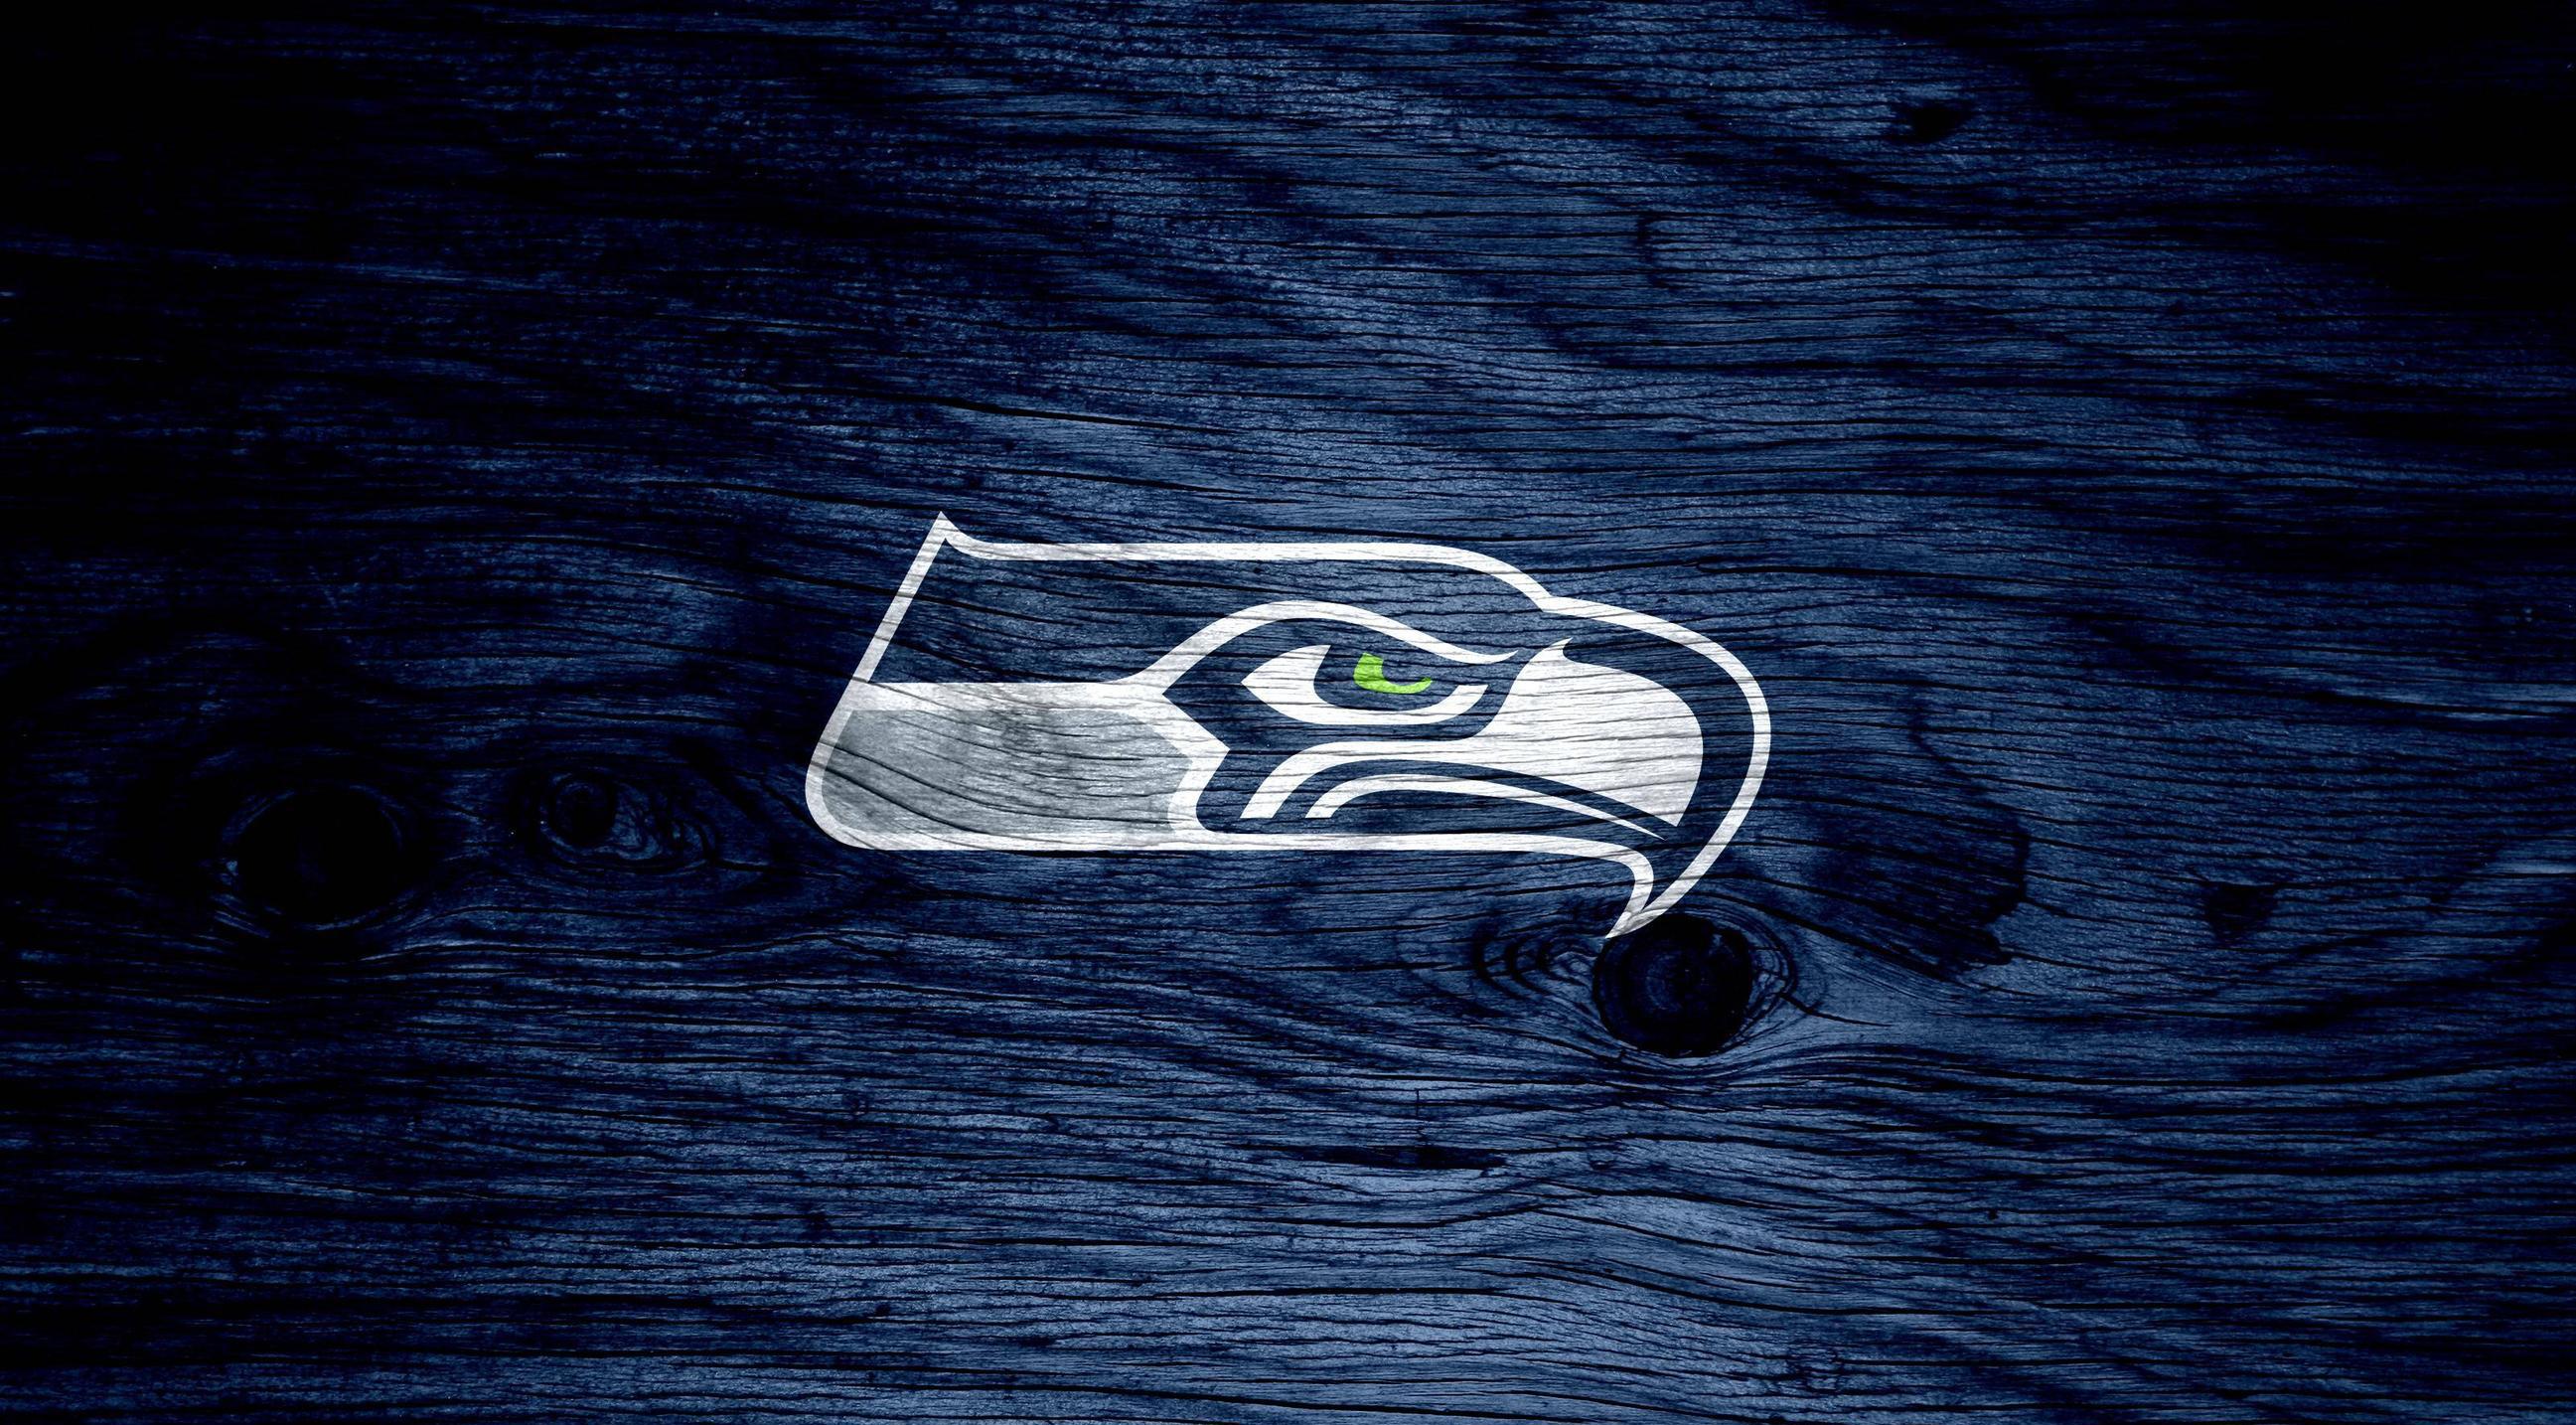 Seattle Seahawks Football Nfl 24 Wallpaper 2593x1434 226366 Wallpaperup